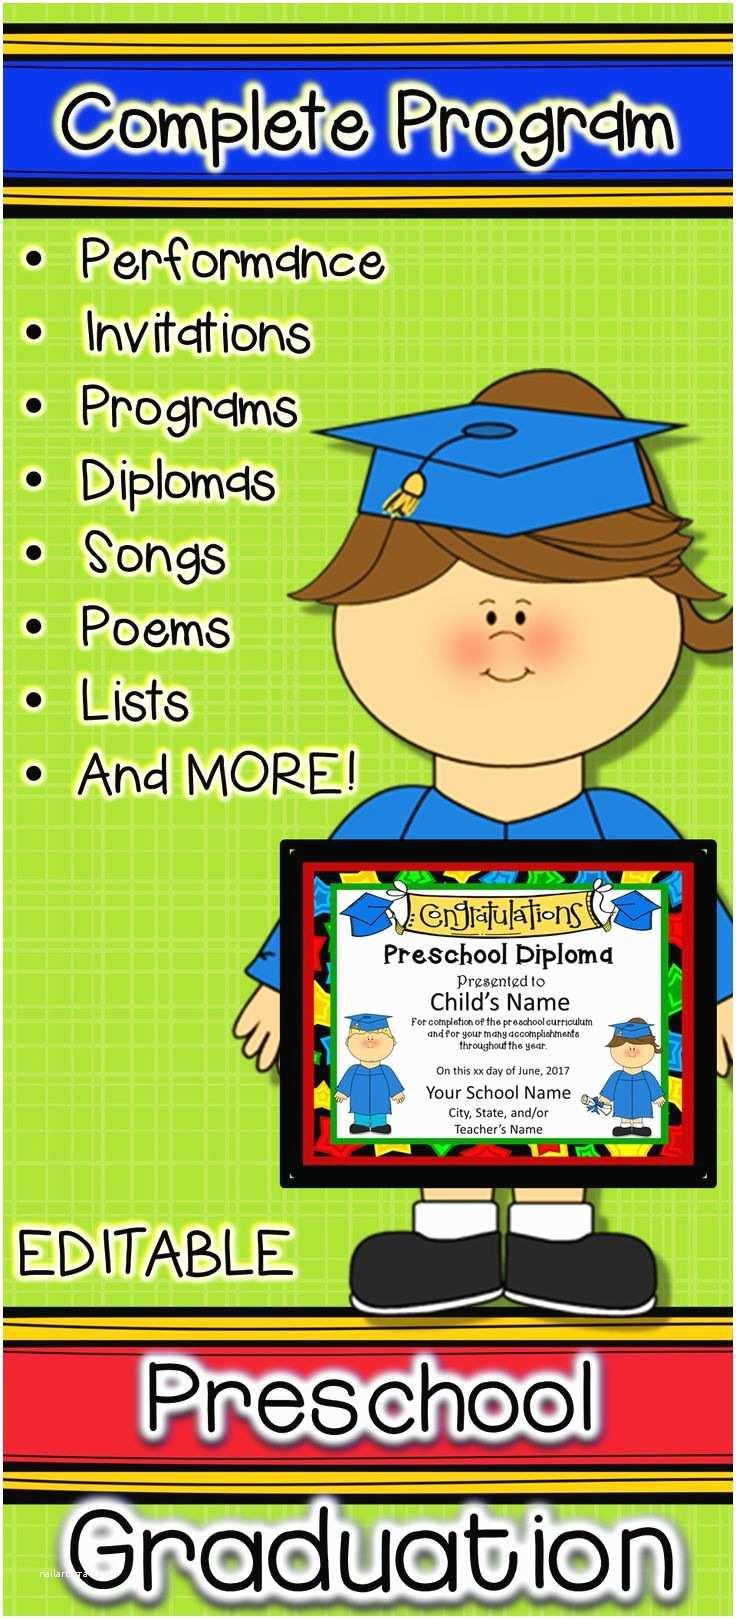 Kindergarten Graduation Invitations Preschool Graduation Diplomas Invitations and Program